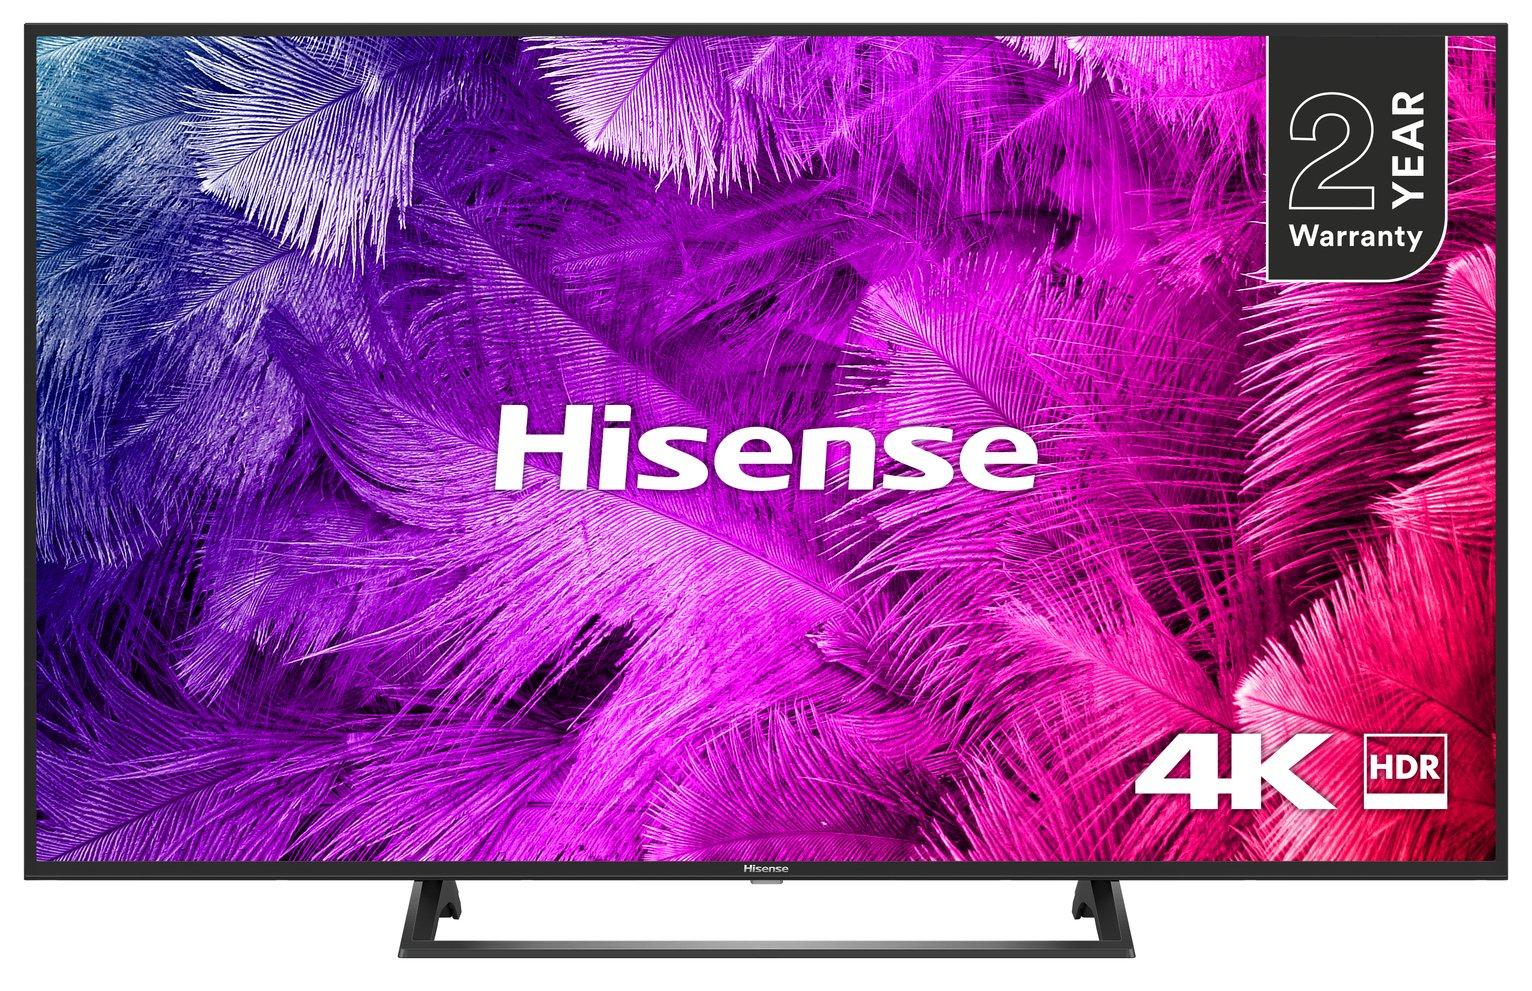 Hisense 43 Inch H43B7300UK Smart 4K HDR LED TV - £279 at Argos